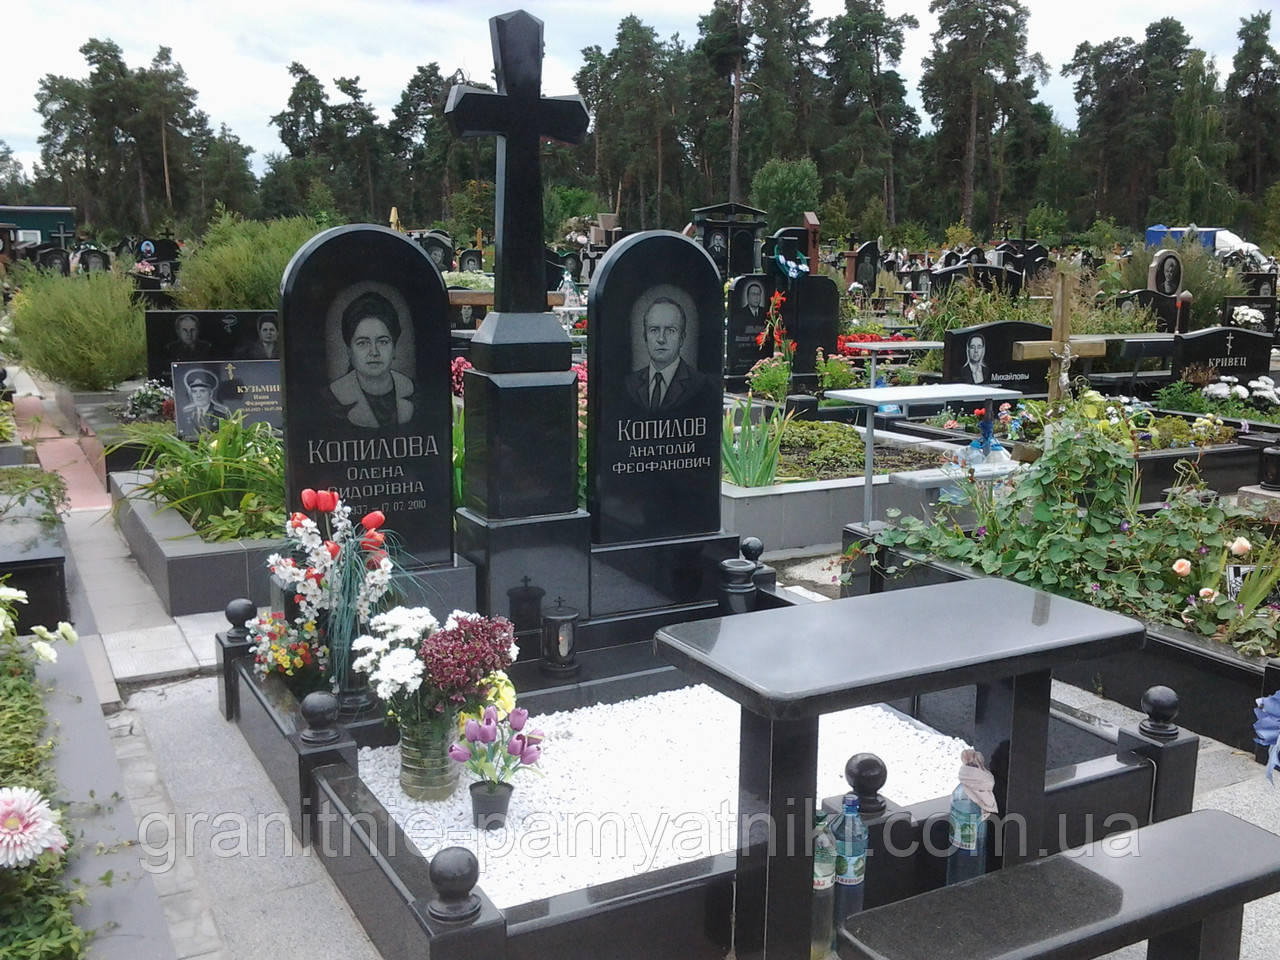 Памятники на могилу цена в steam памятники уфа цены Новый Уренгой